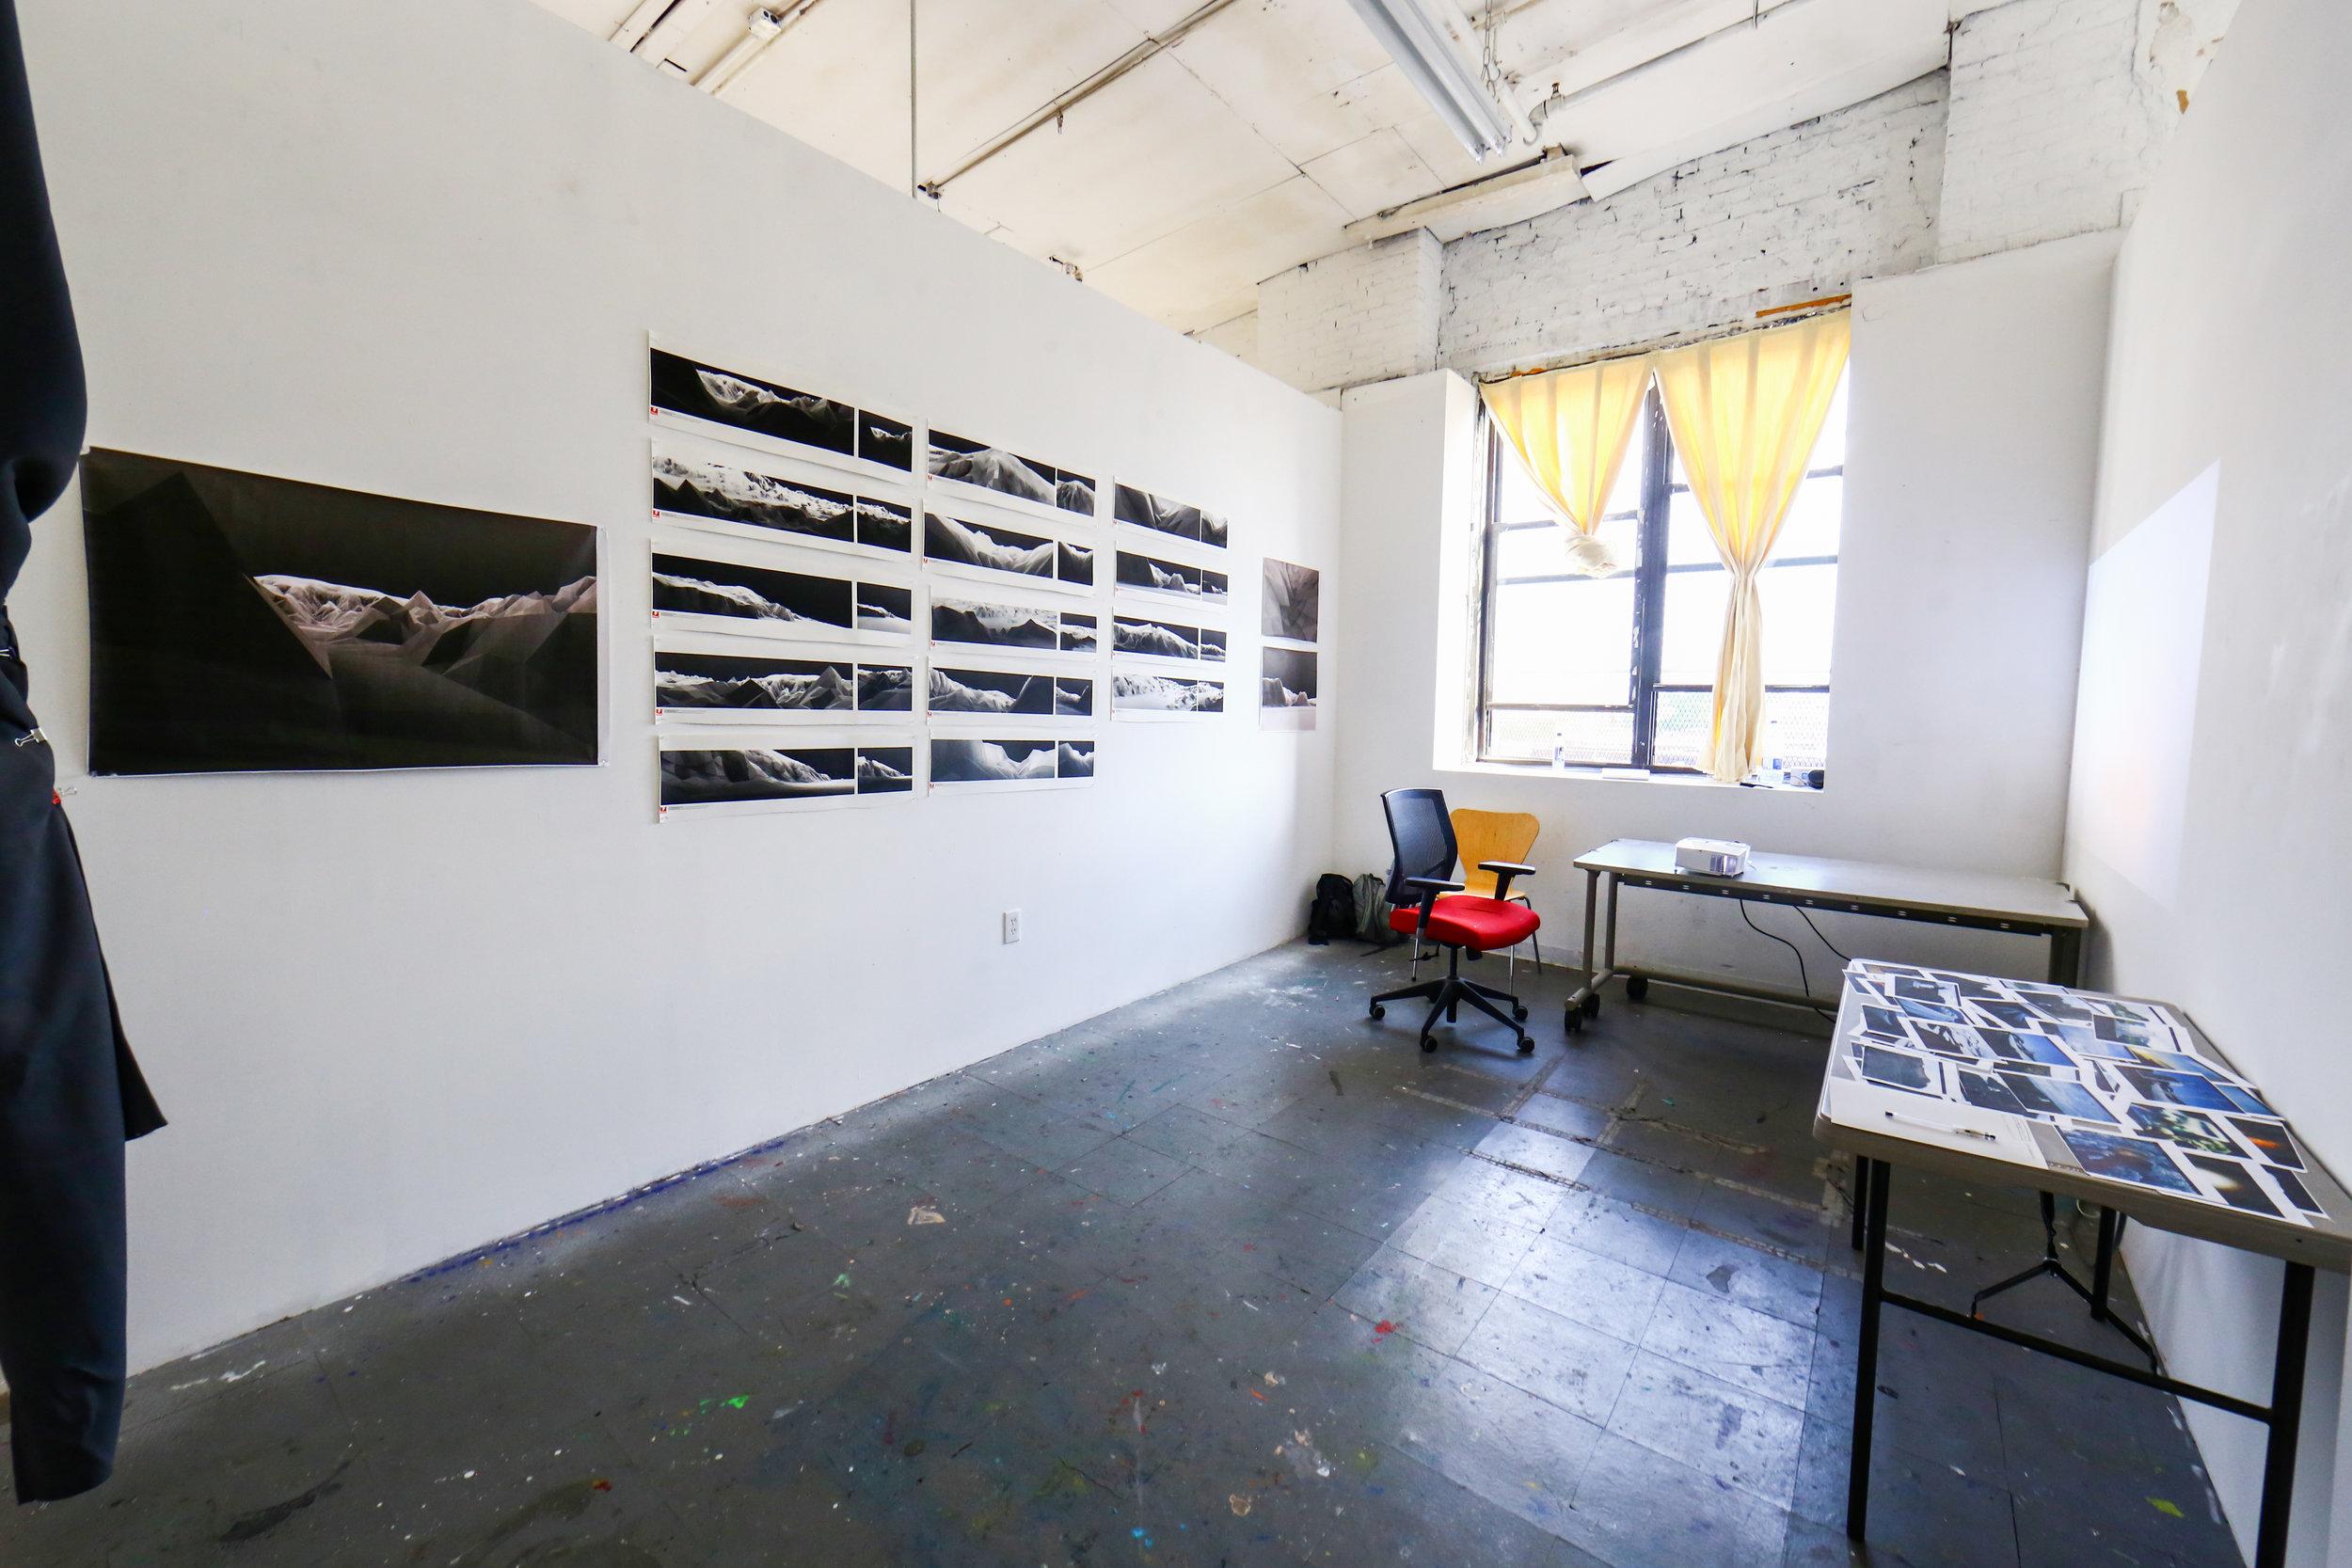 Spring 2018 Residency Exhibition_023.JPG